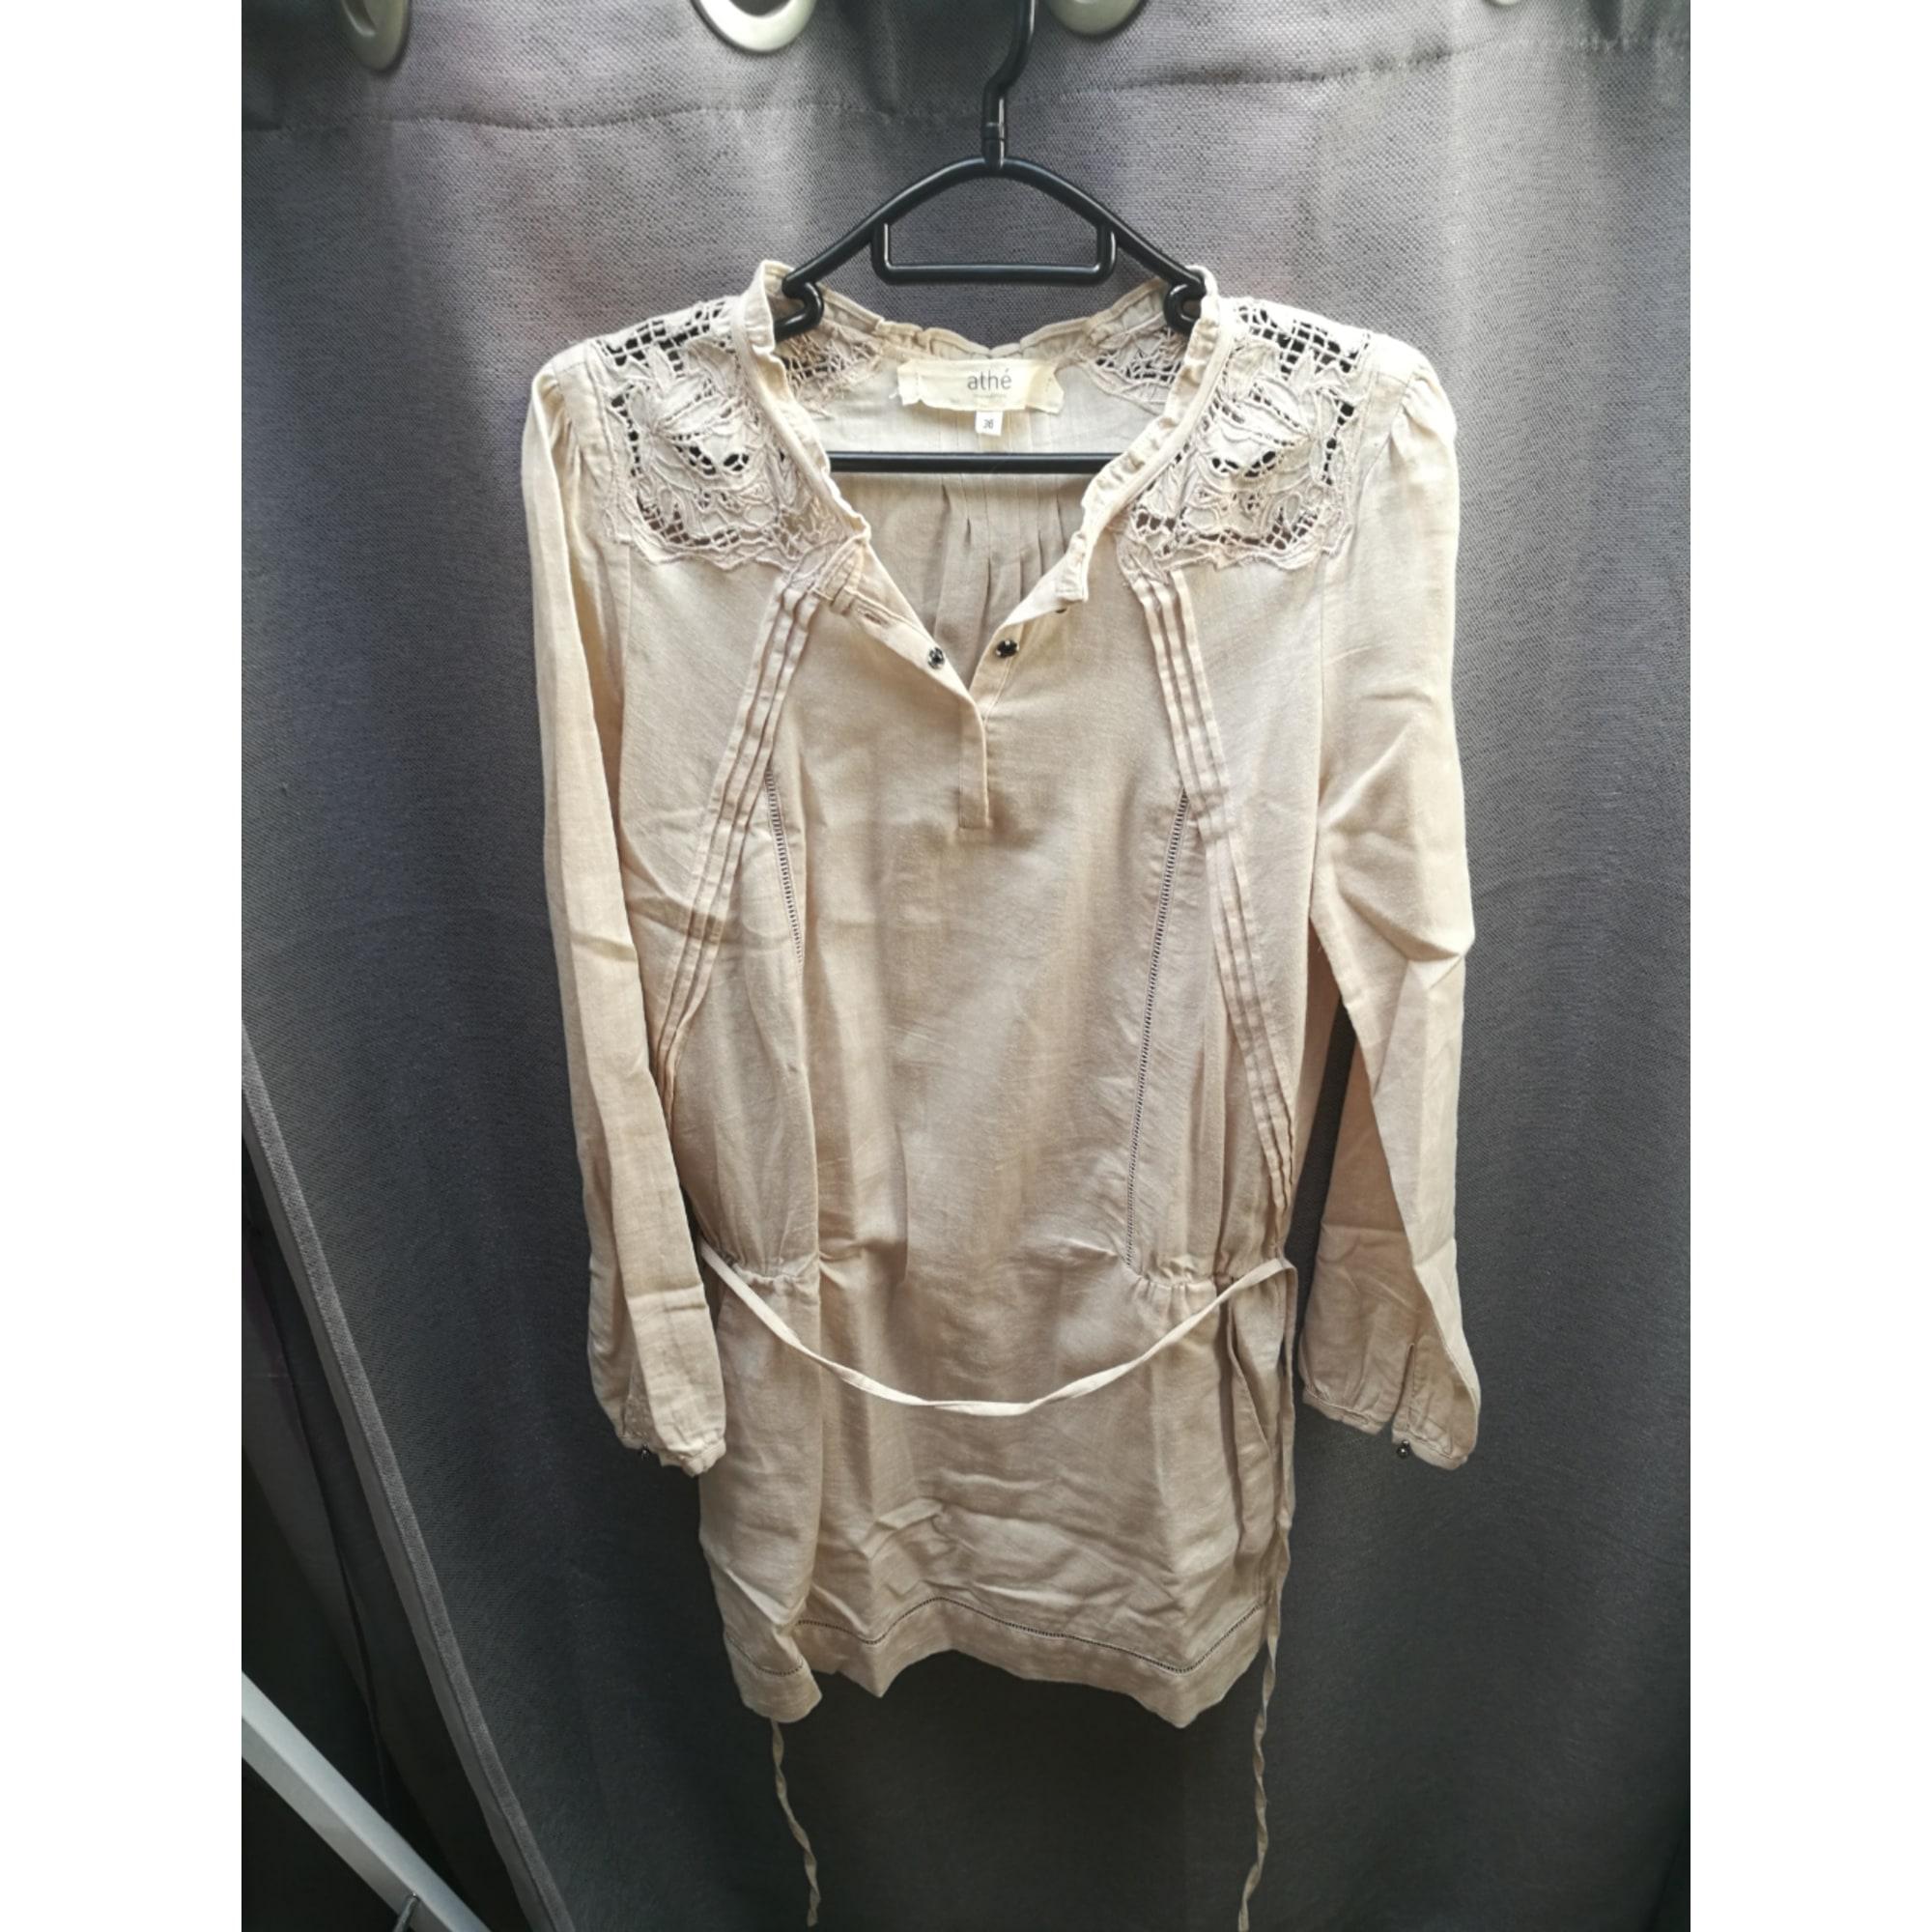 Robe tunique ATHÉ VANESSA BRUNO Blanc, blanc cassé, écru